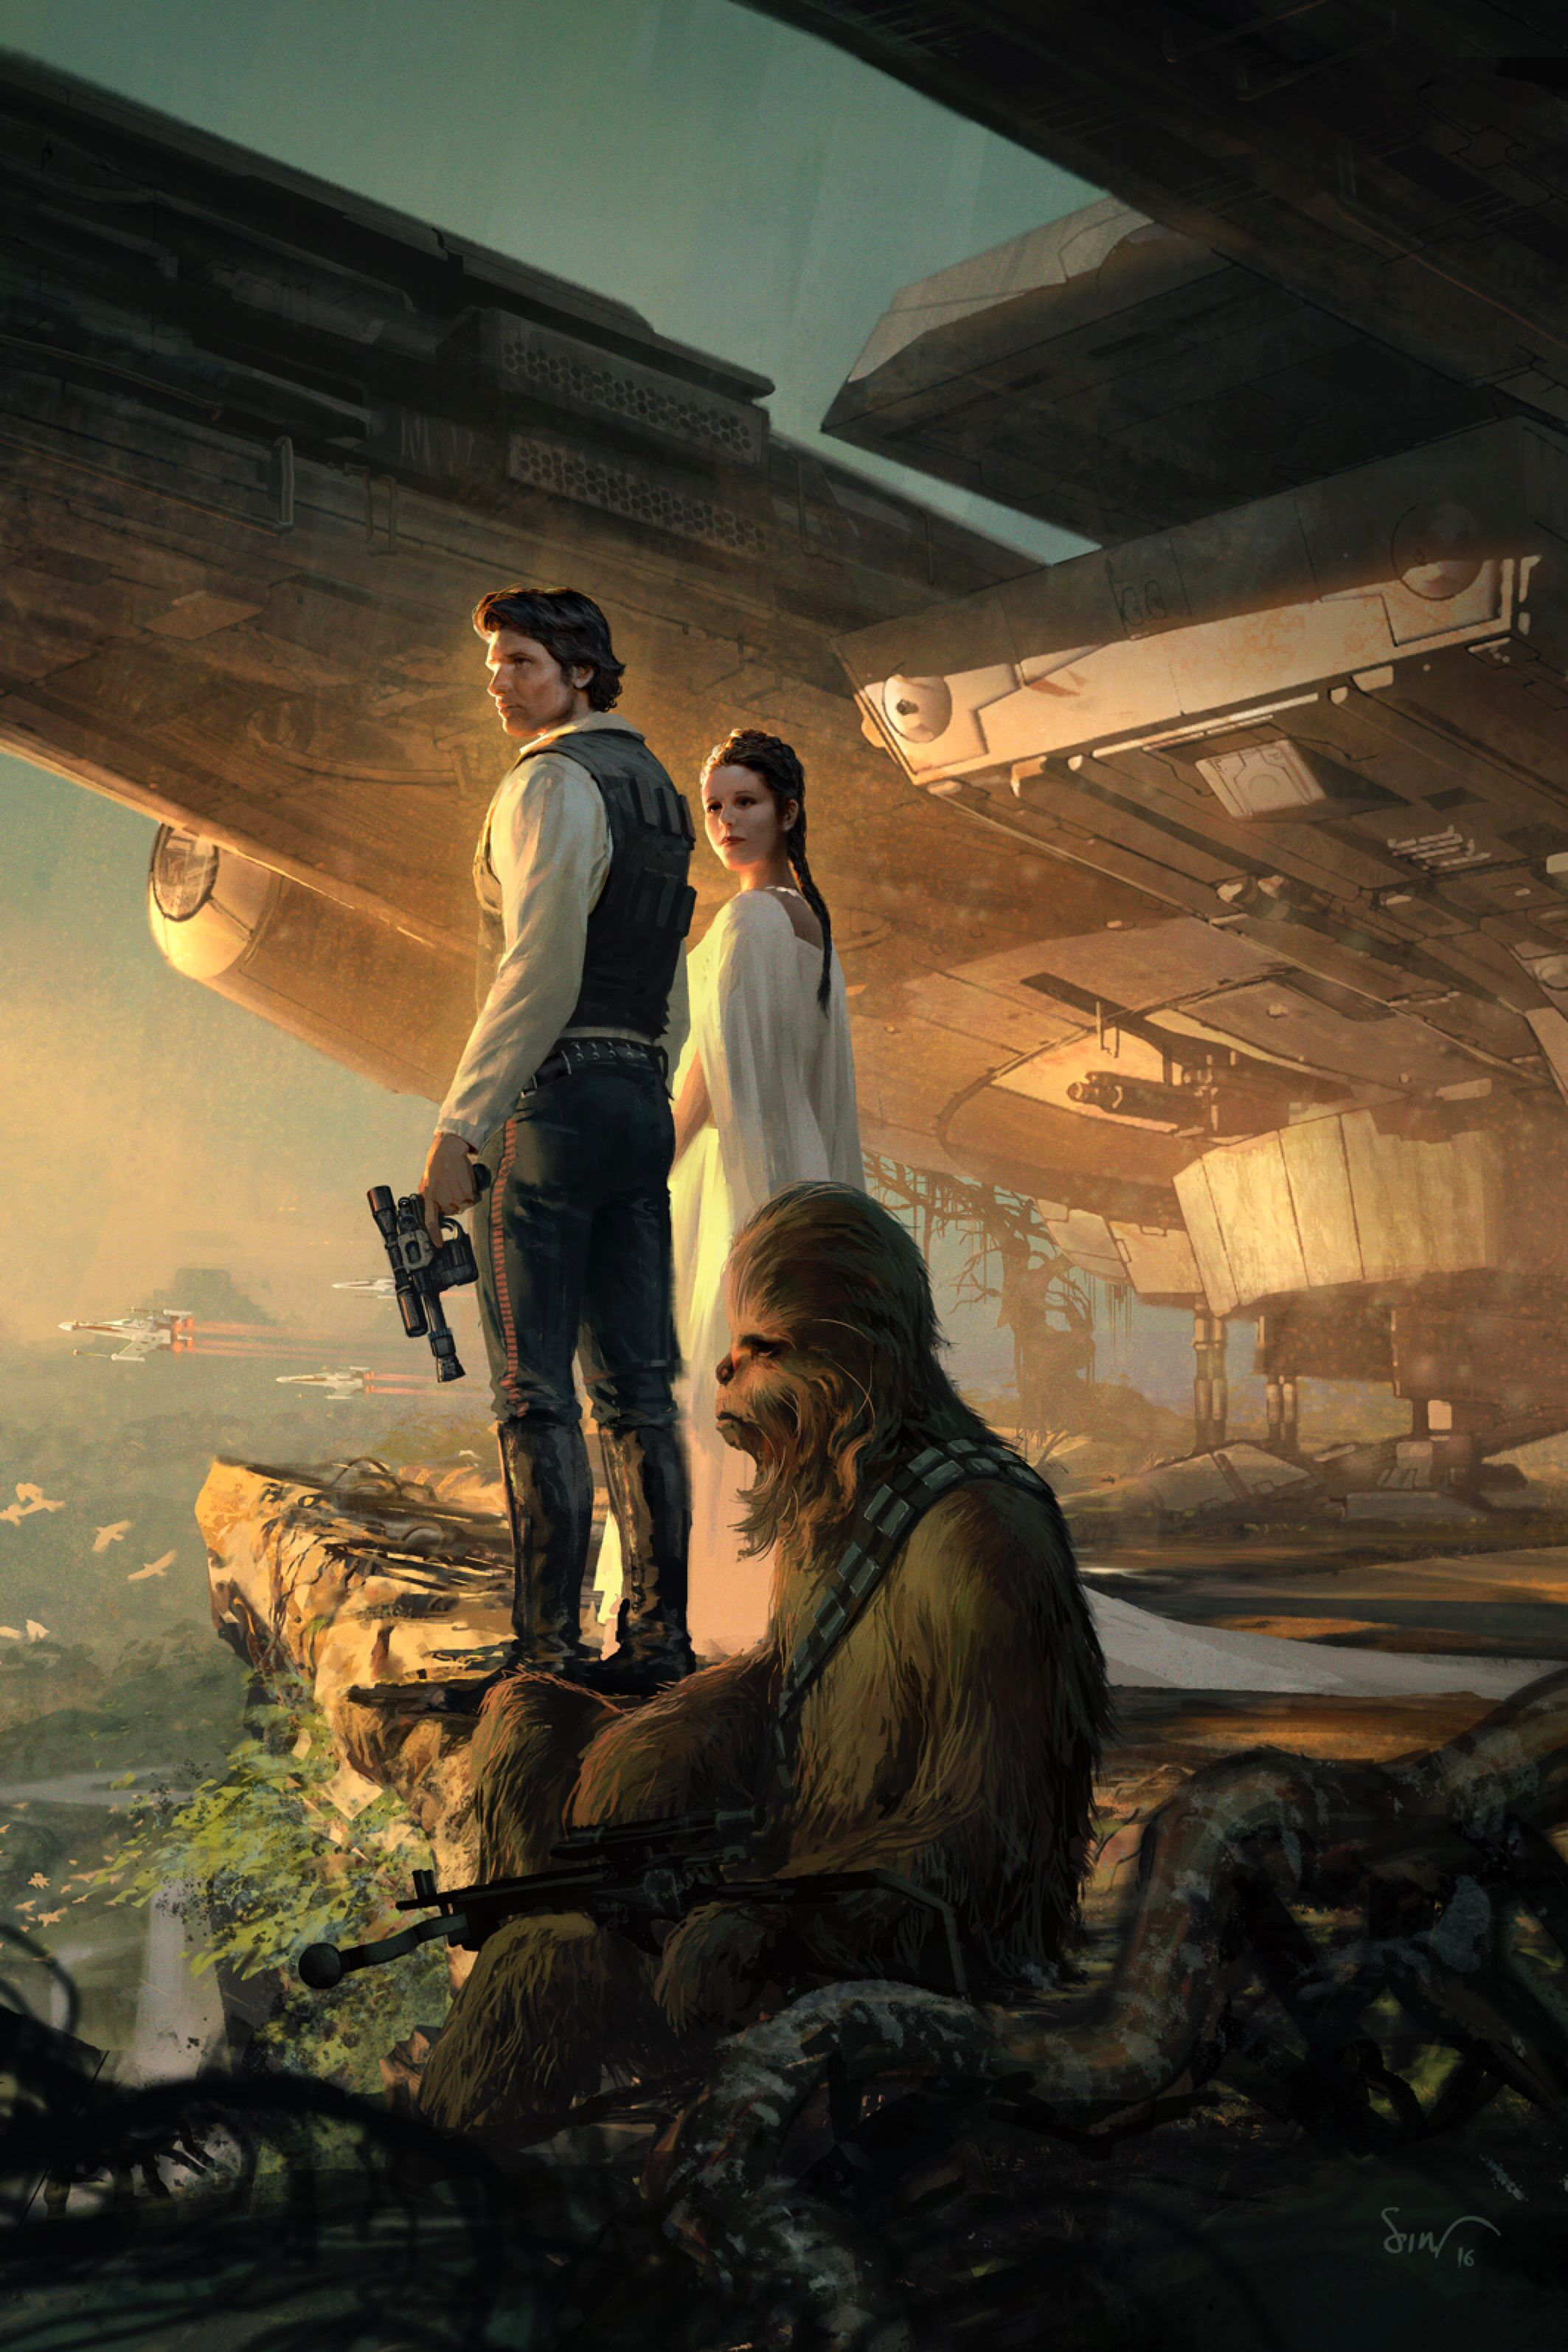 Han Solo Princess Leia Organa Chewbacca Star Wars Star Wars Illustration Star Wars Art Star Wars Poster